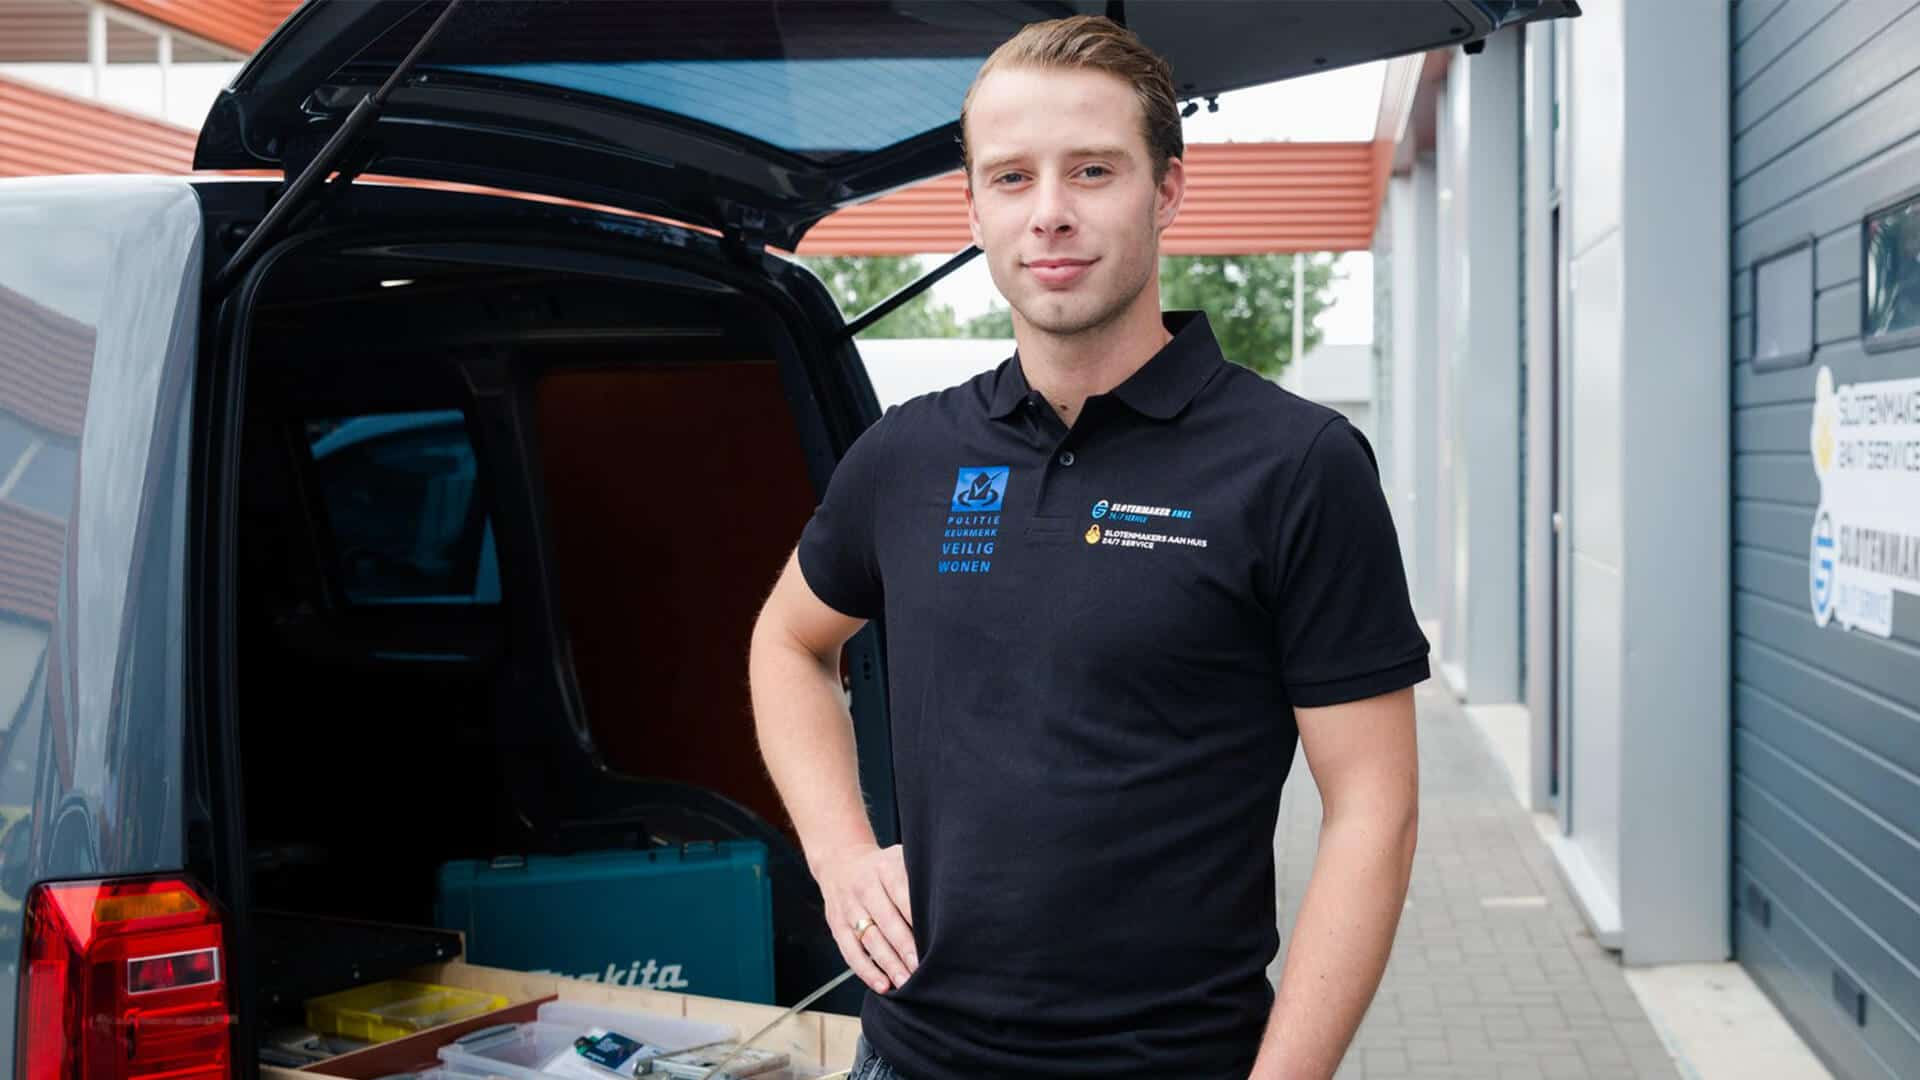 Slotenmaker Aalten2)